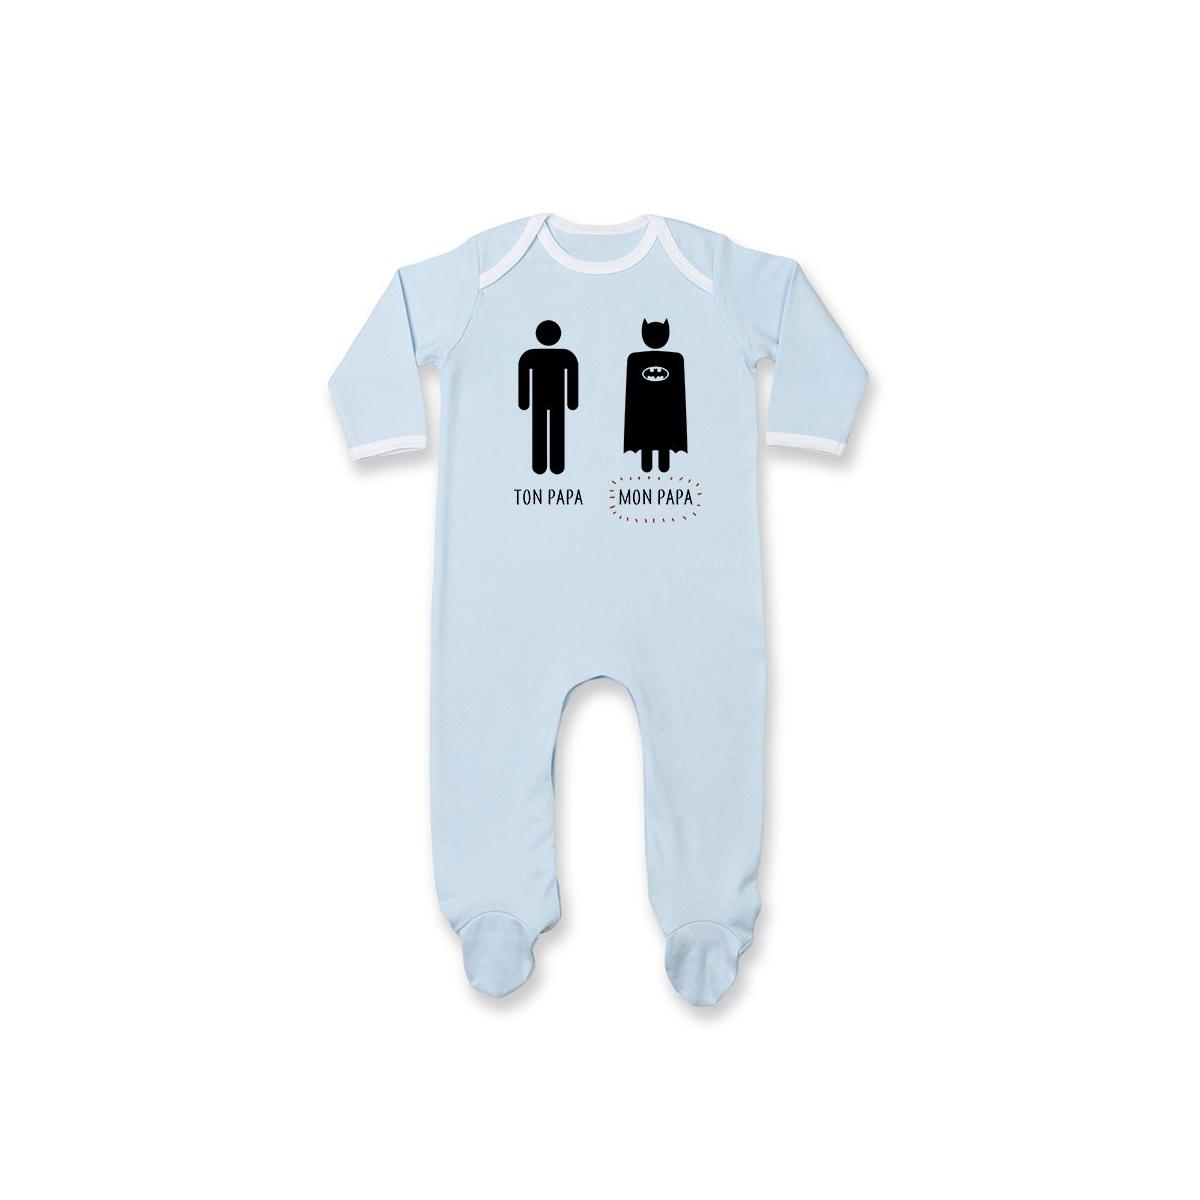 Pyjama bébé Ton papa, Mon papa